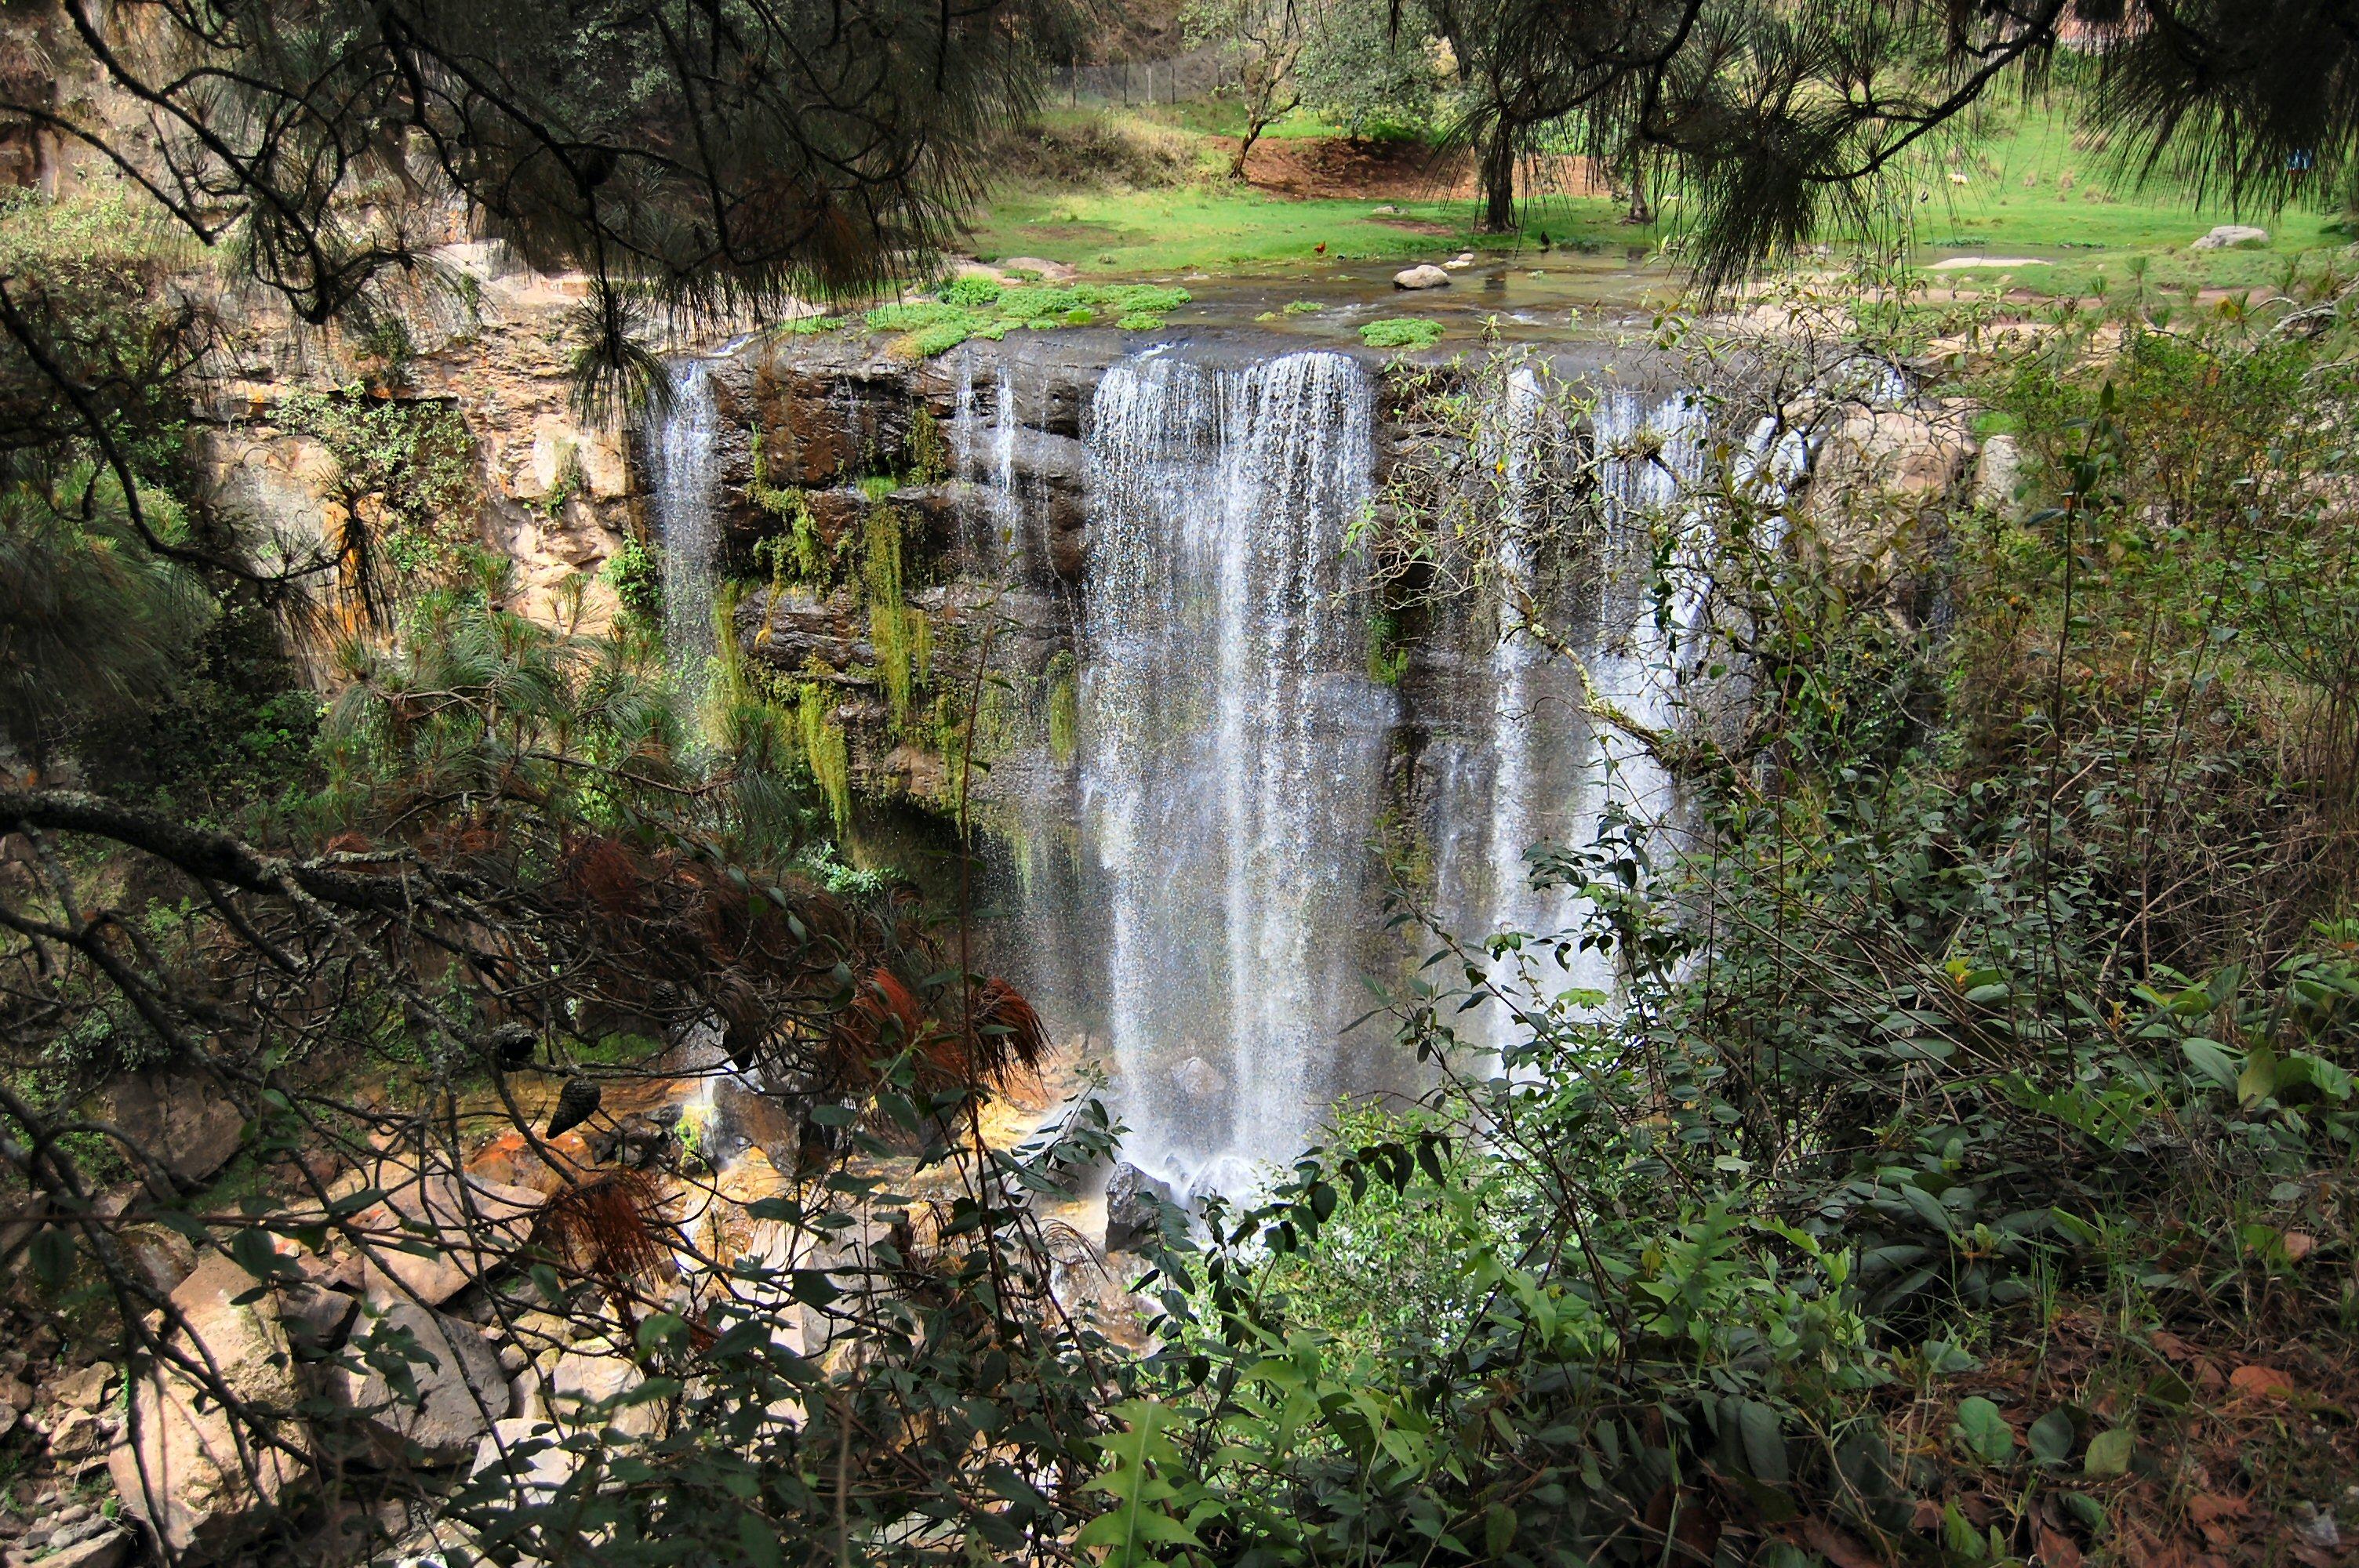 caída de la cascada de San Pedro